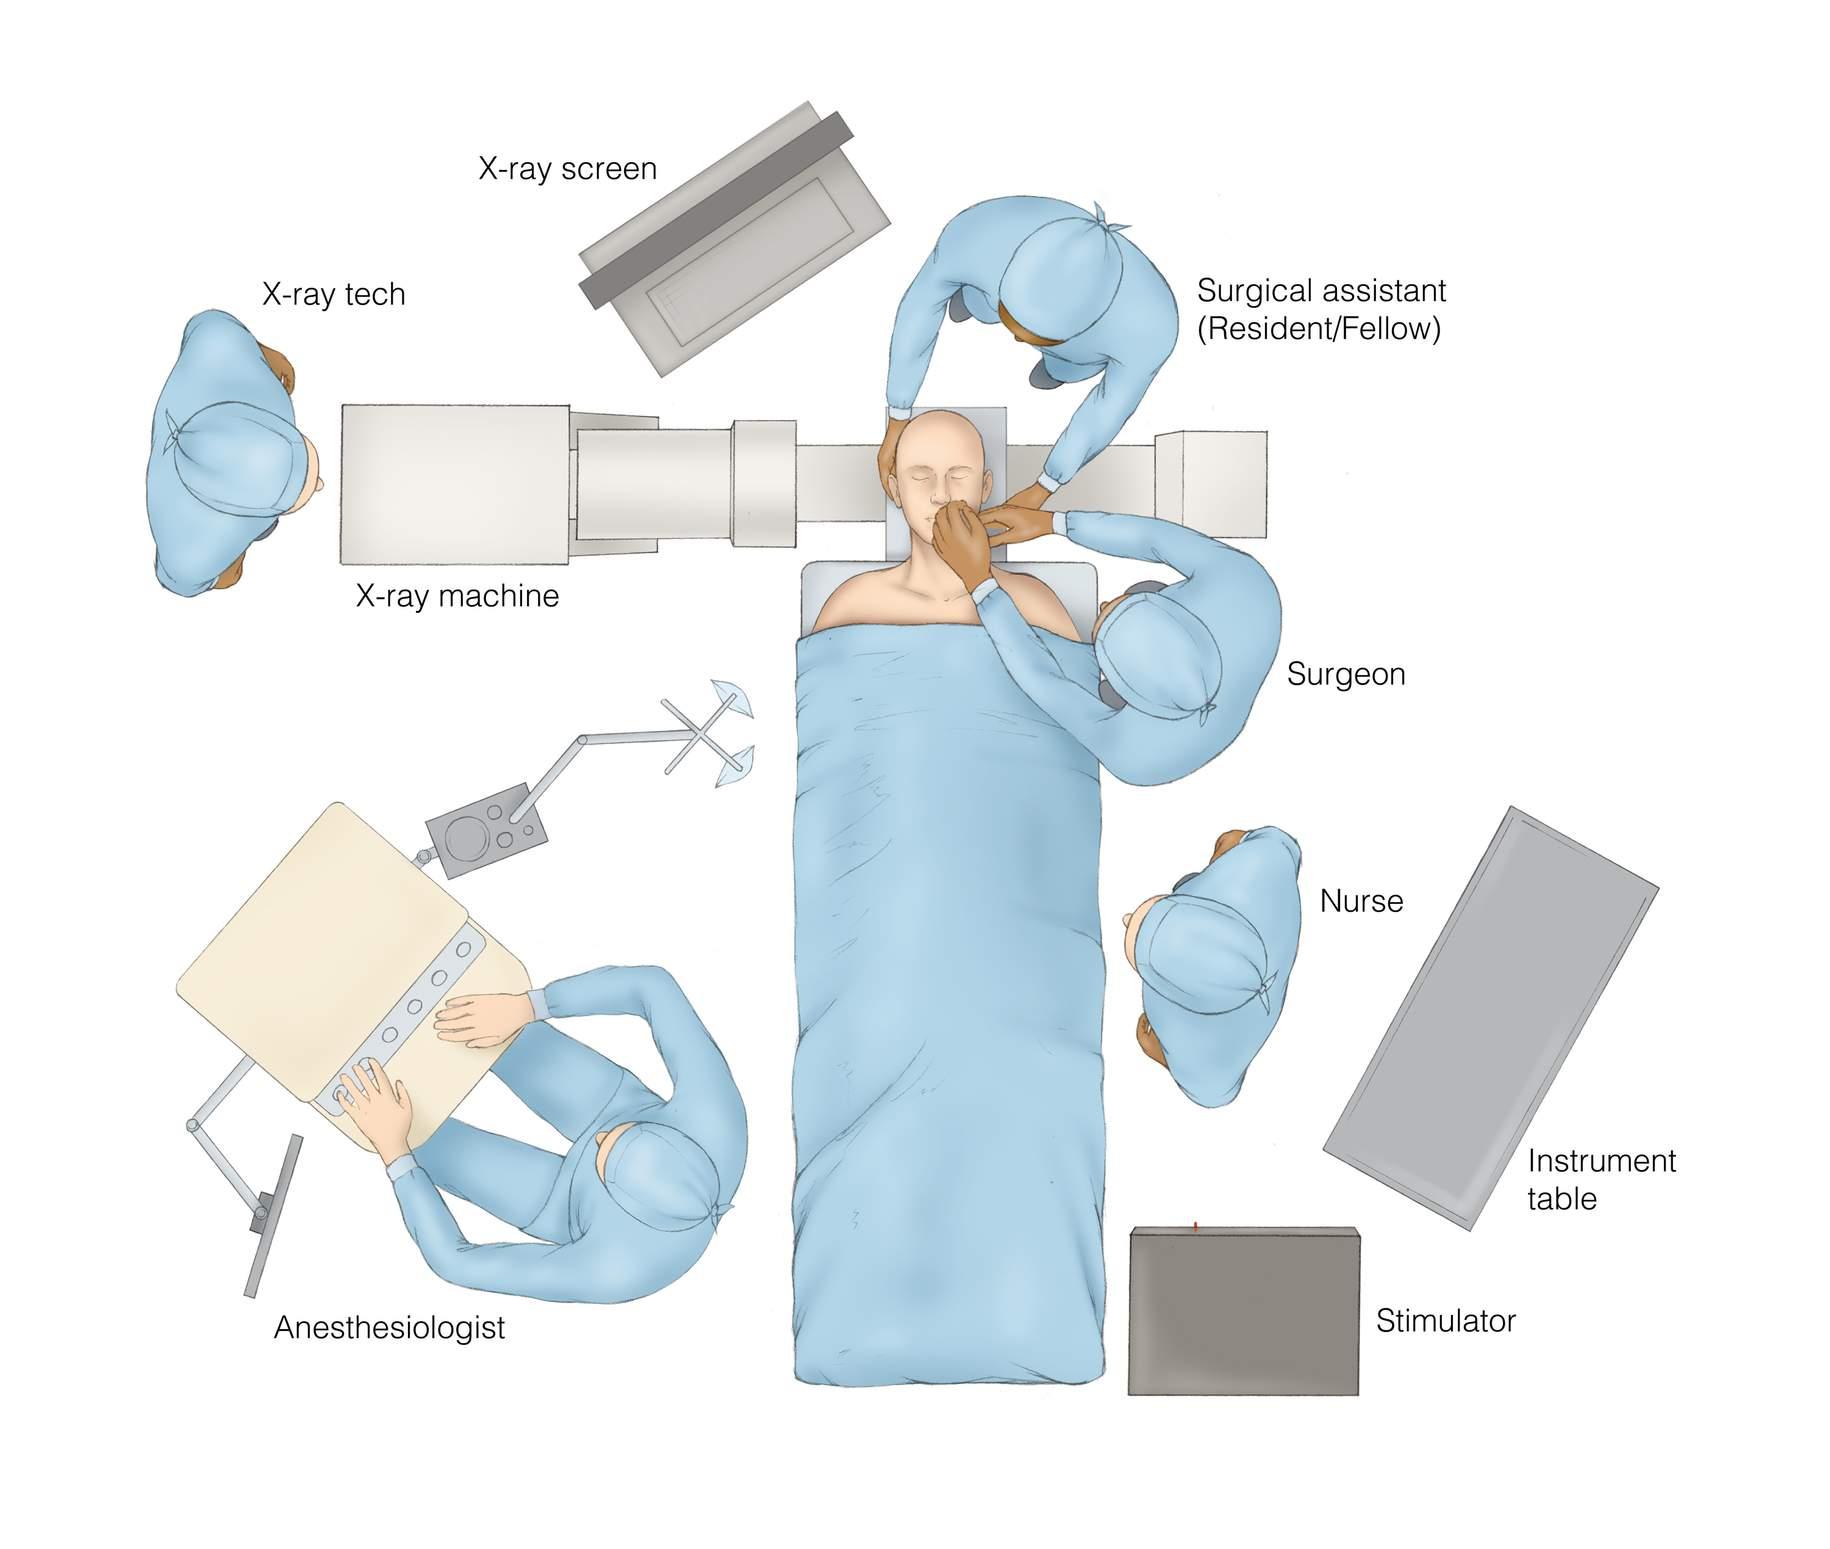 Figure 5: The organization of the operating room for a percutaneous trigeminal rhizotomy.